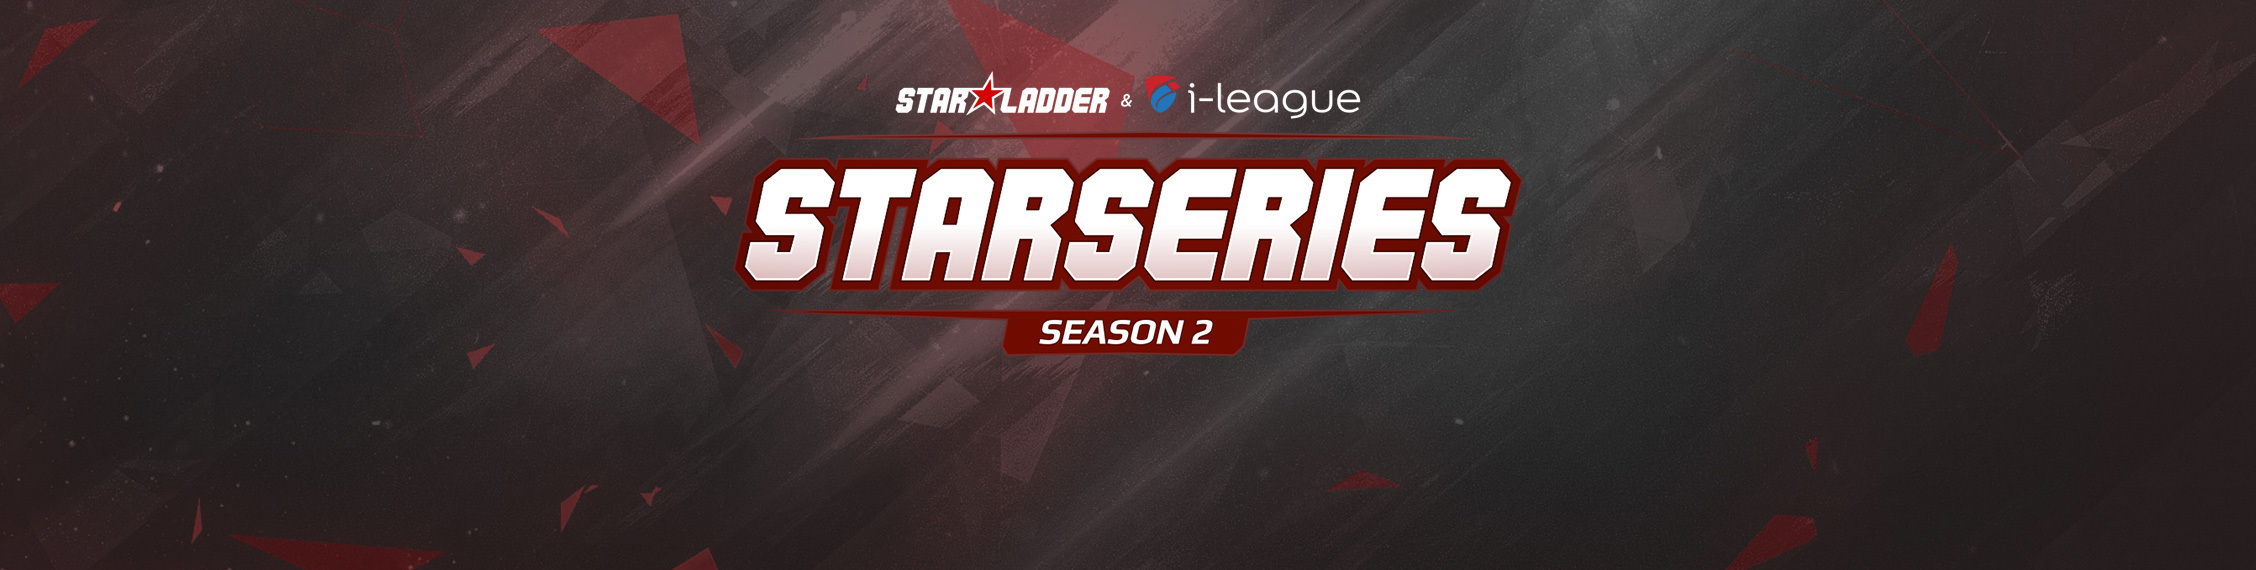 SL i-League StarSeries S2: Dota 2